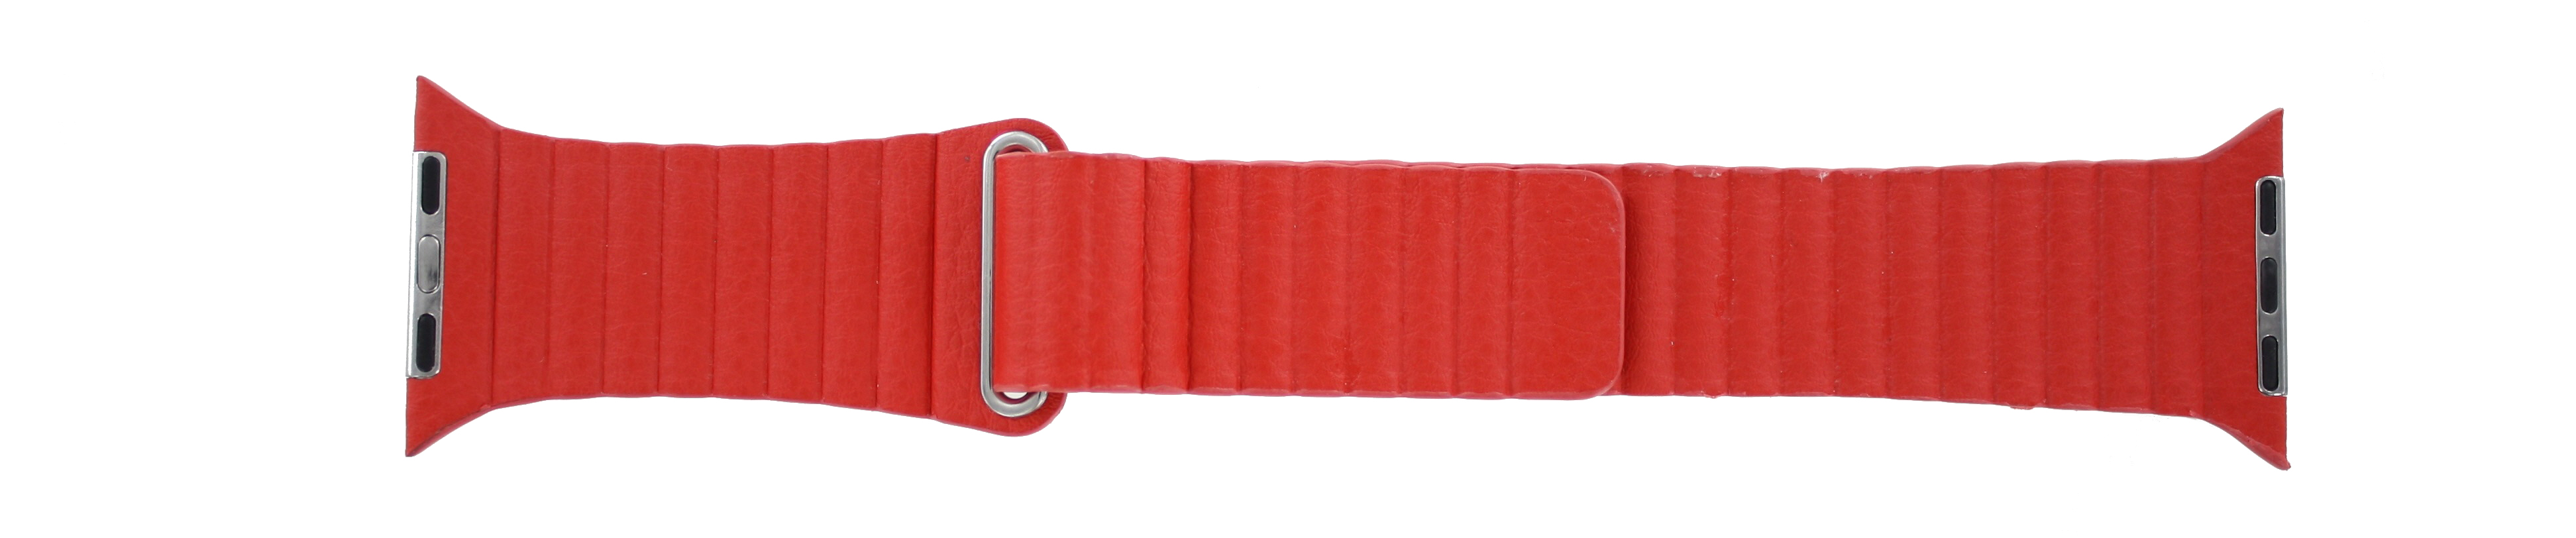 Apple (replacement model) klockarmband LS-AB-110 Läder Rött 42mm